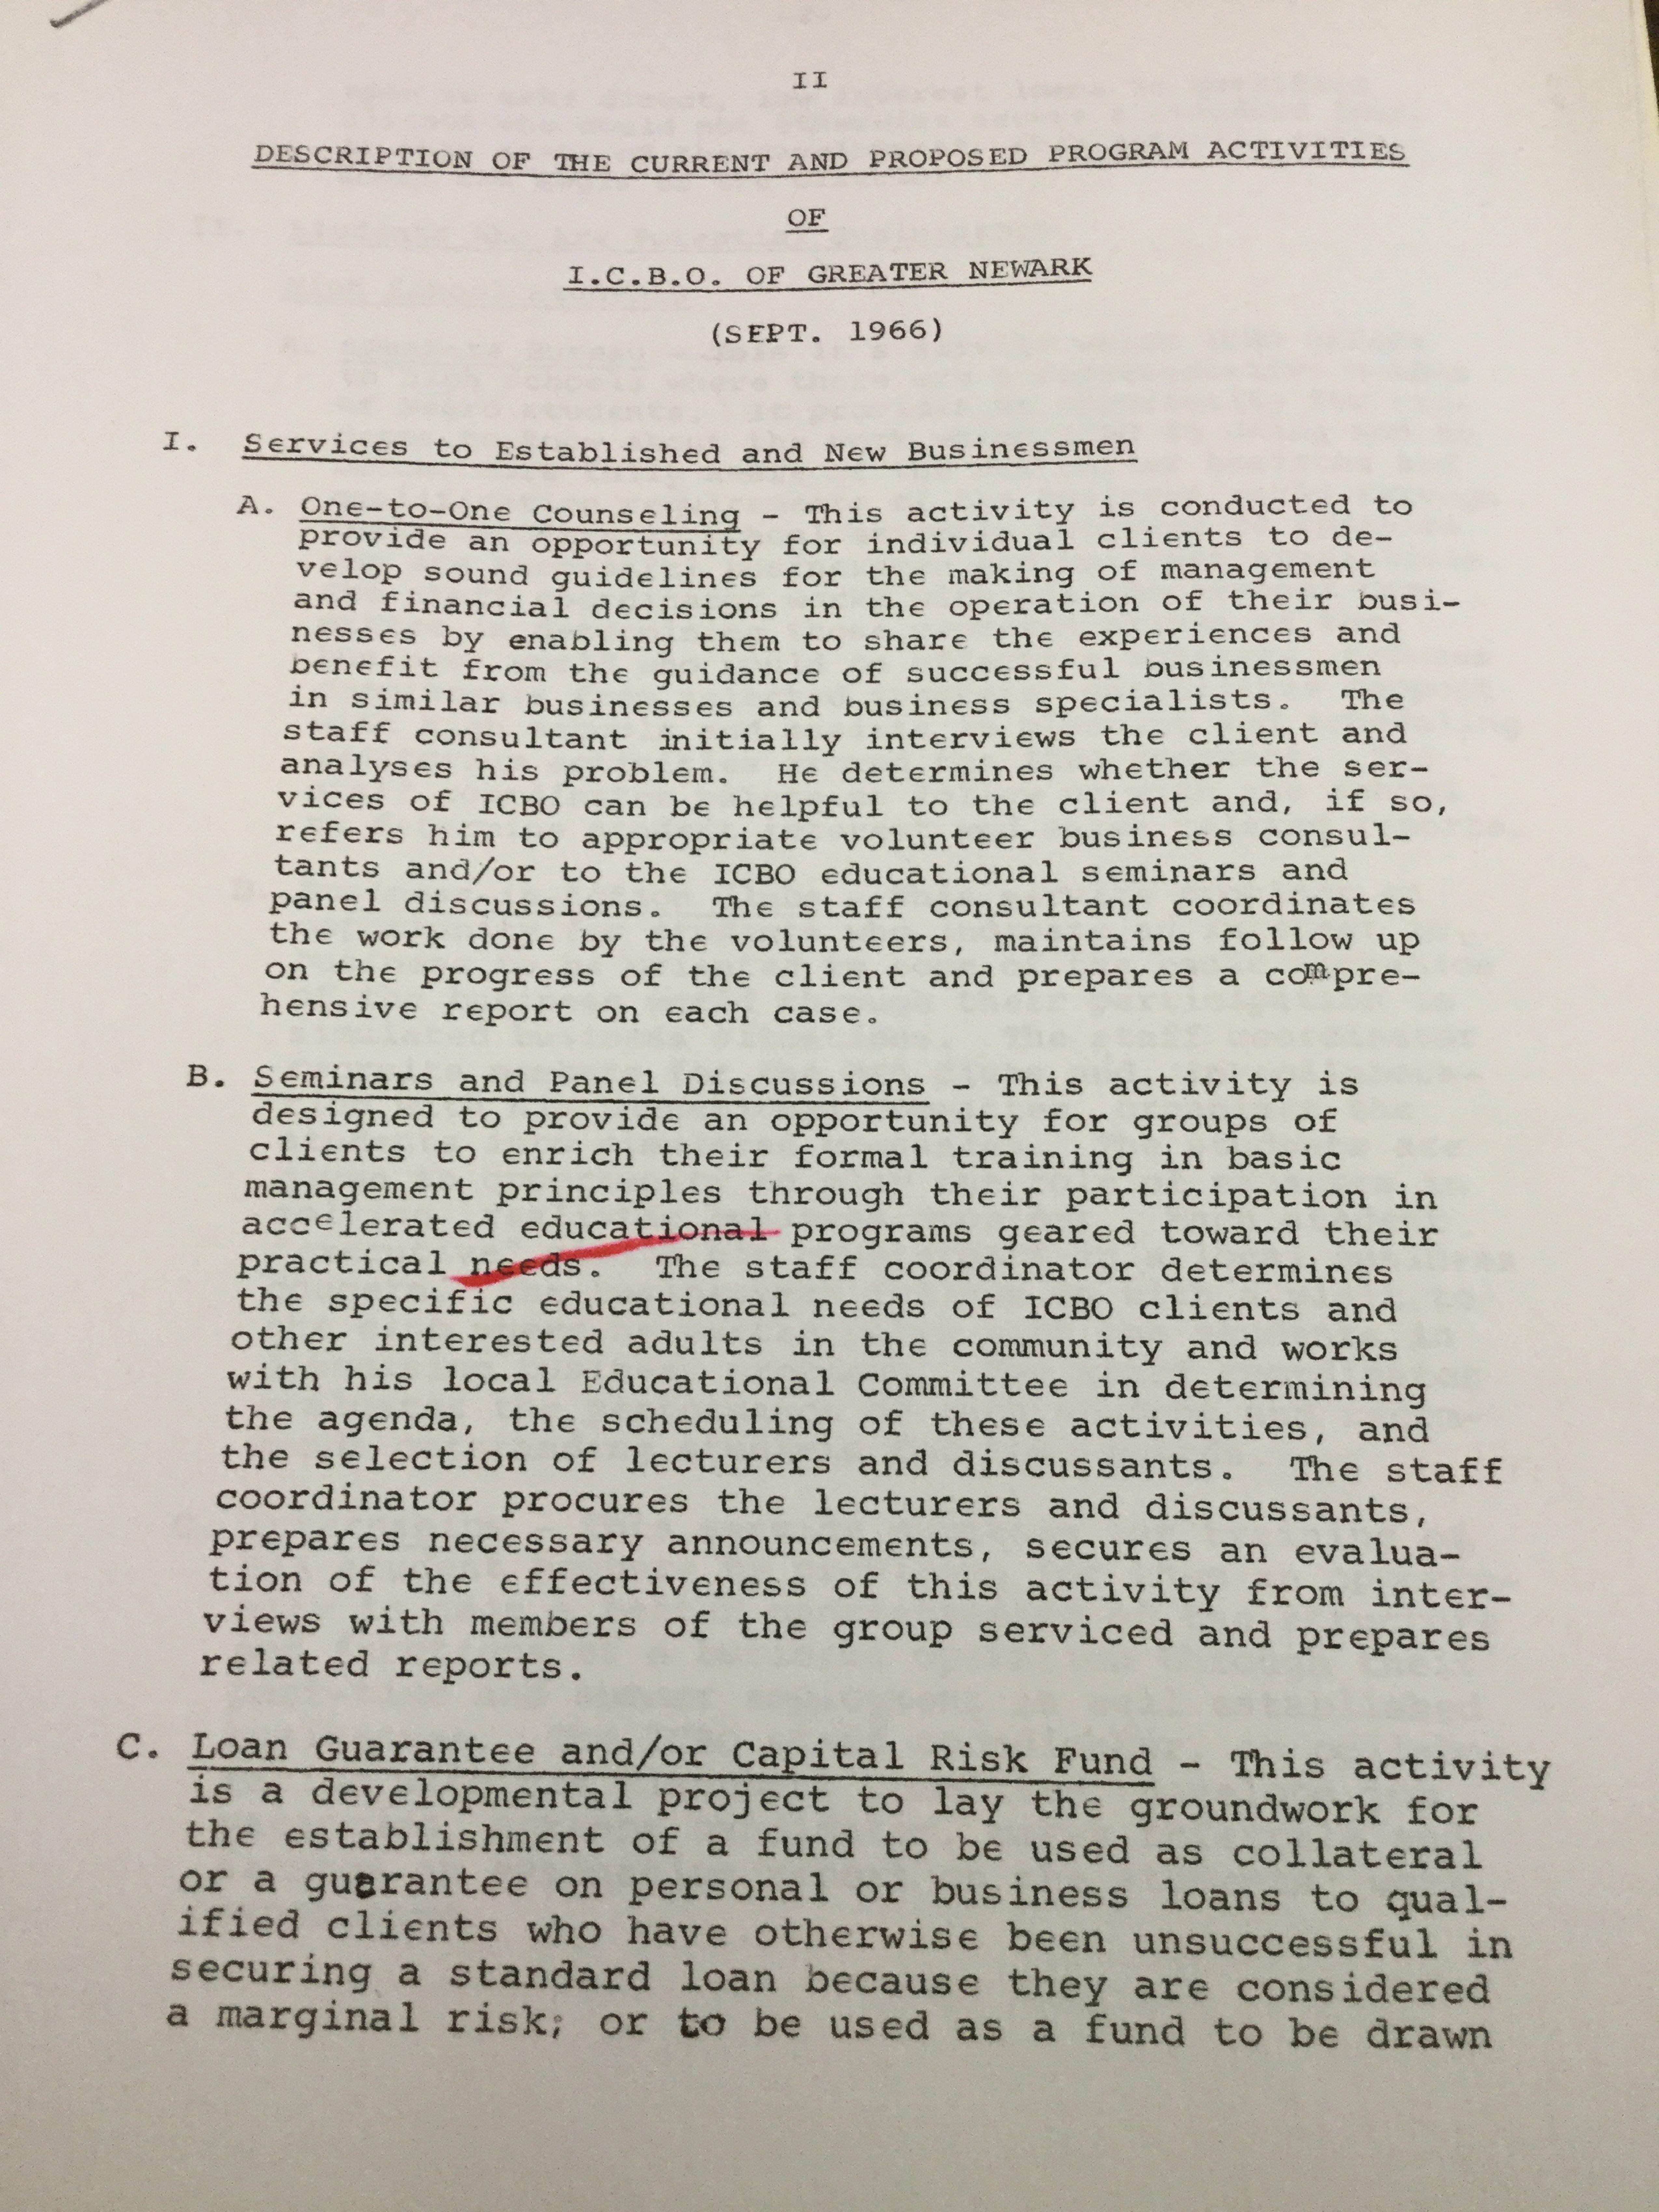 ICBO Proposed Program Activities (1966)